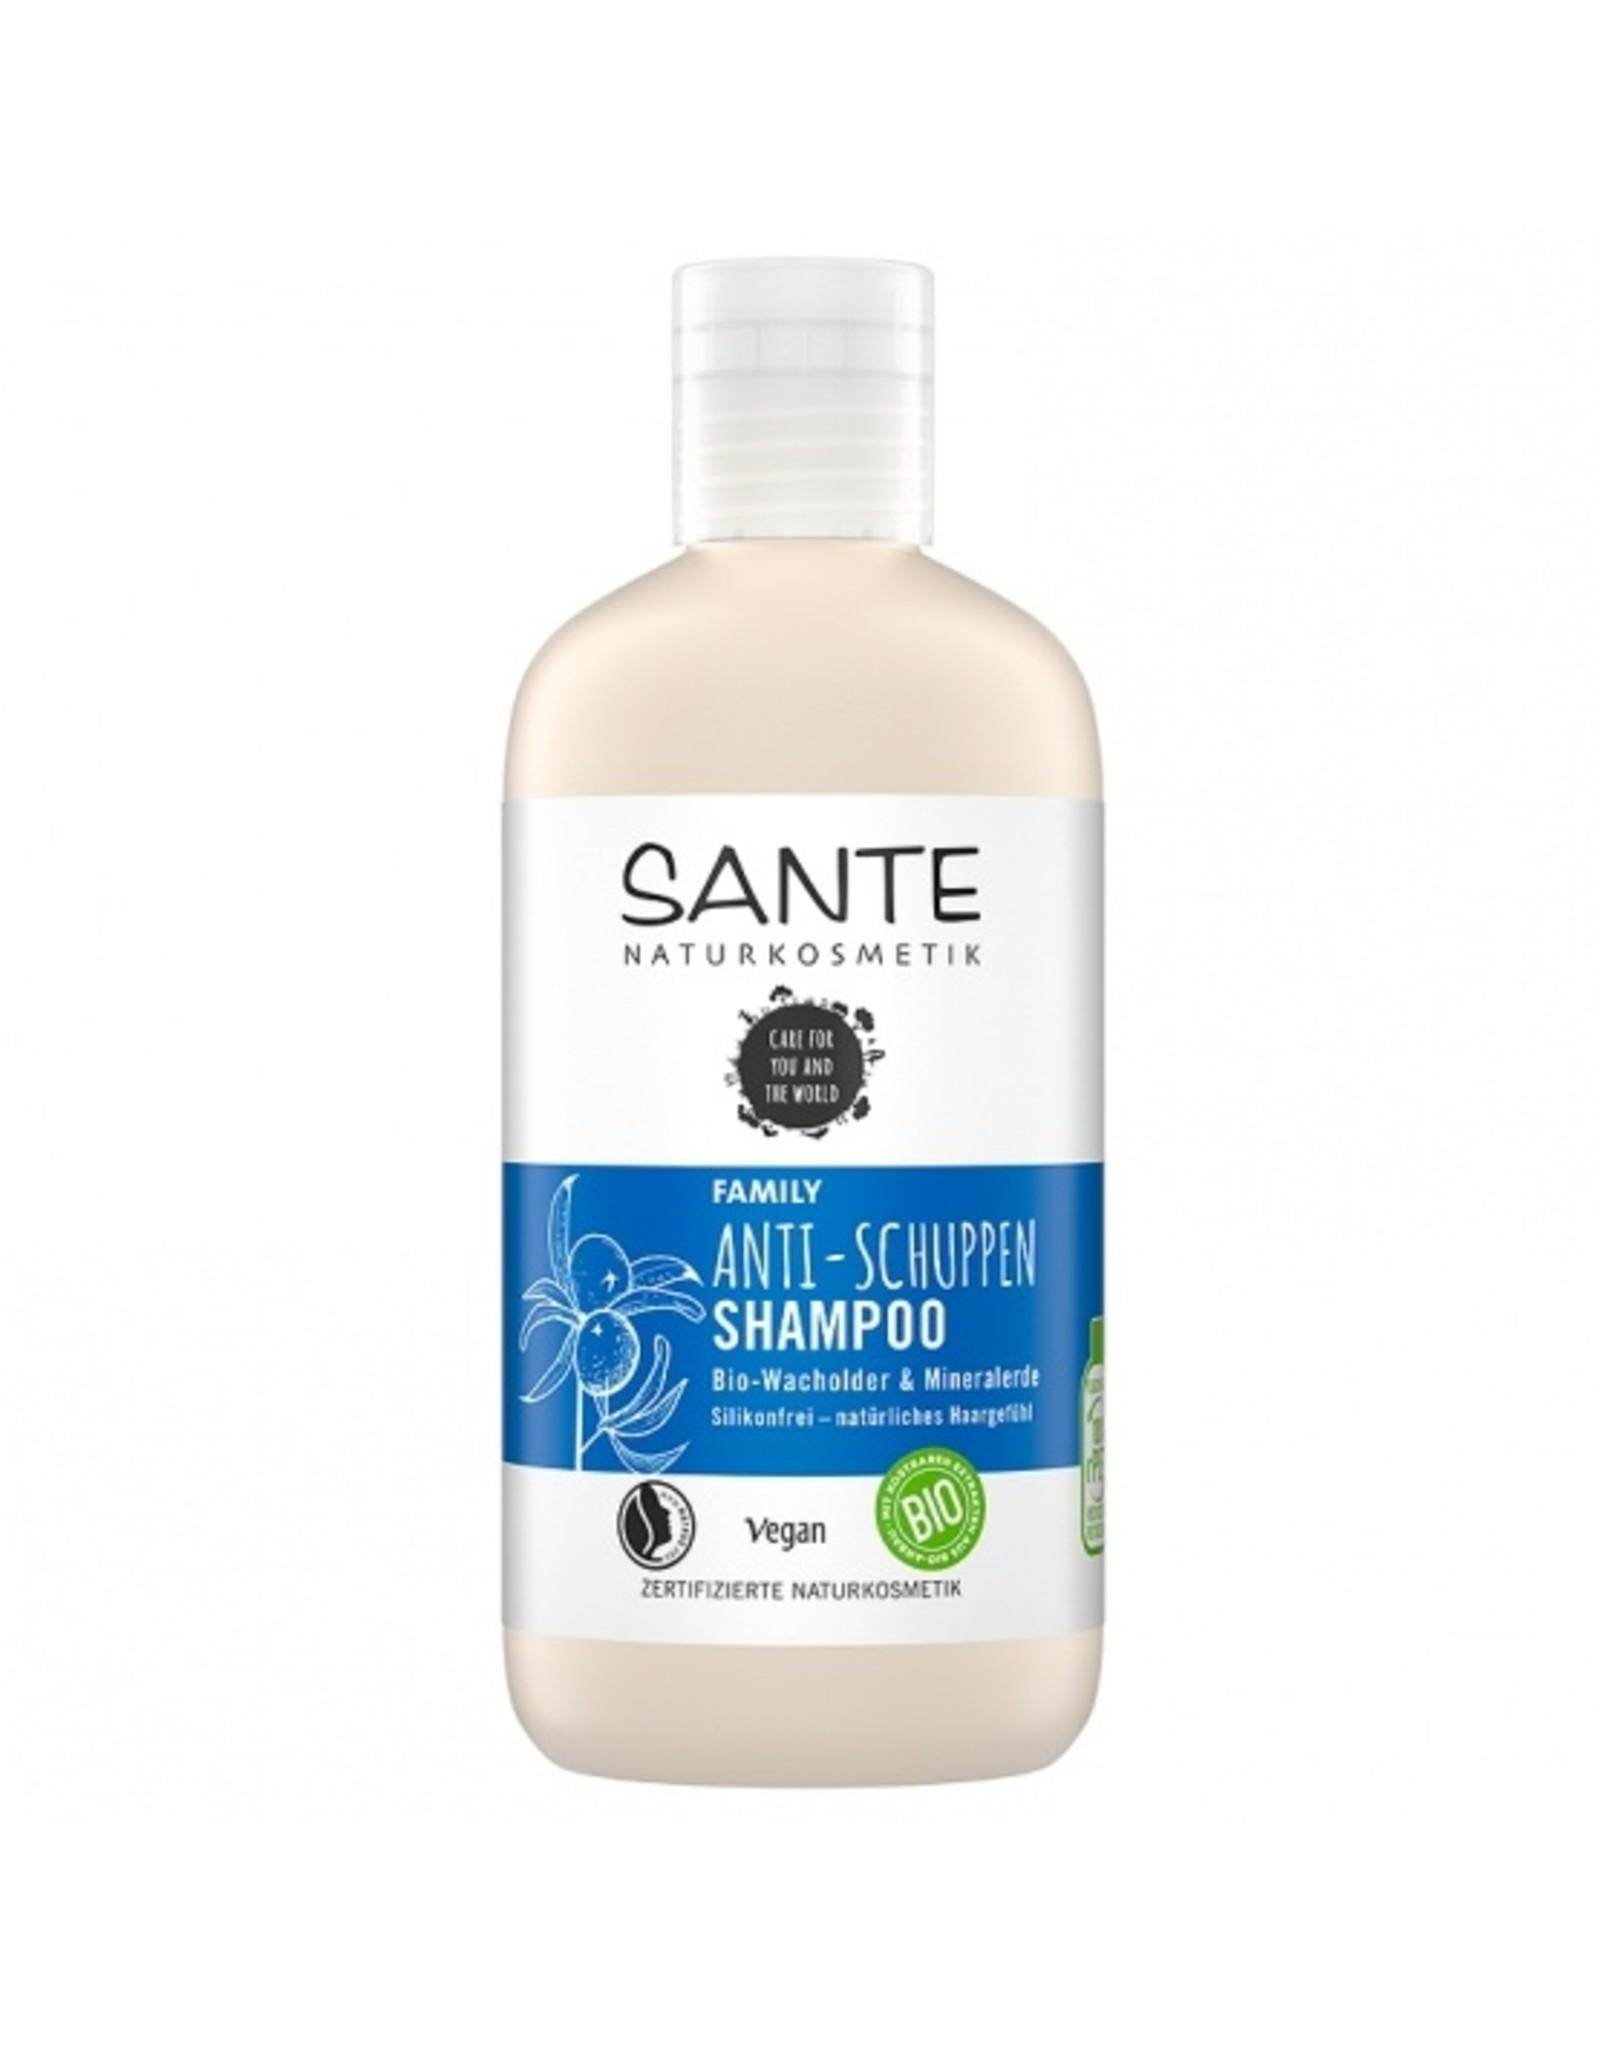 SANTE Family Anti-Schuppen Shampoo Bio-Wacholder & Mineralerde 250ml